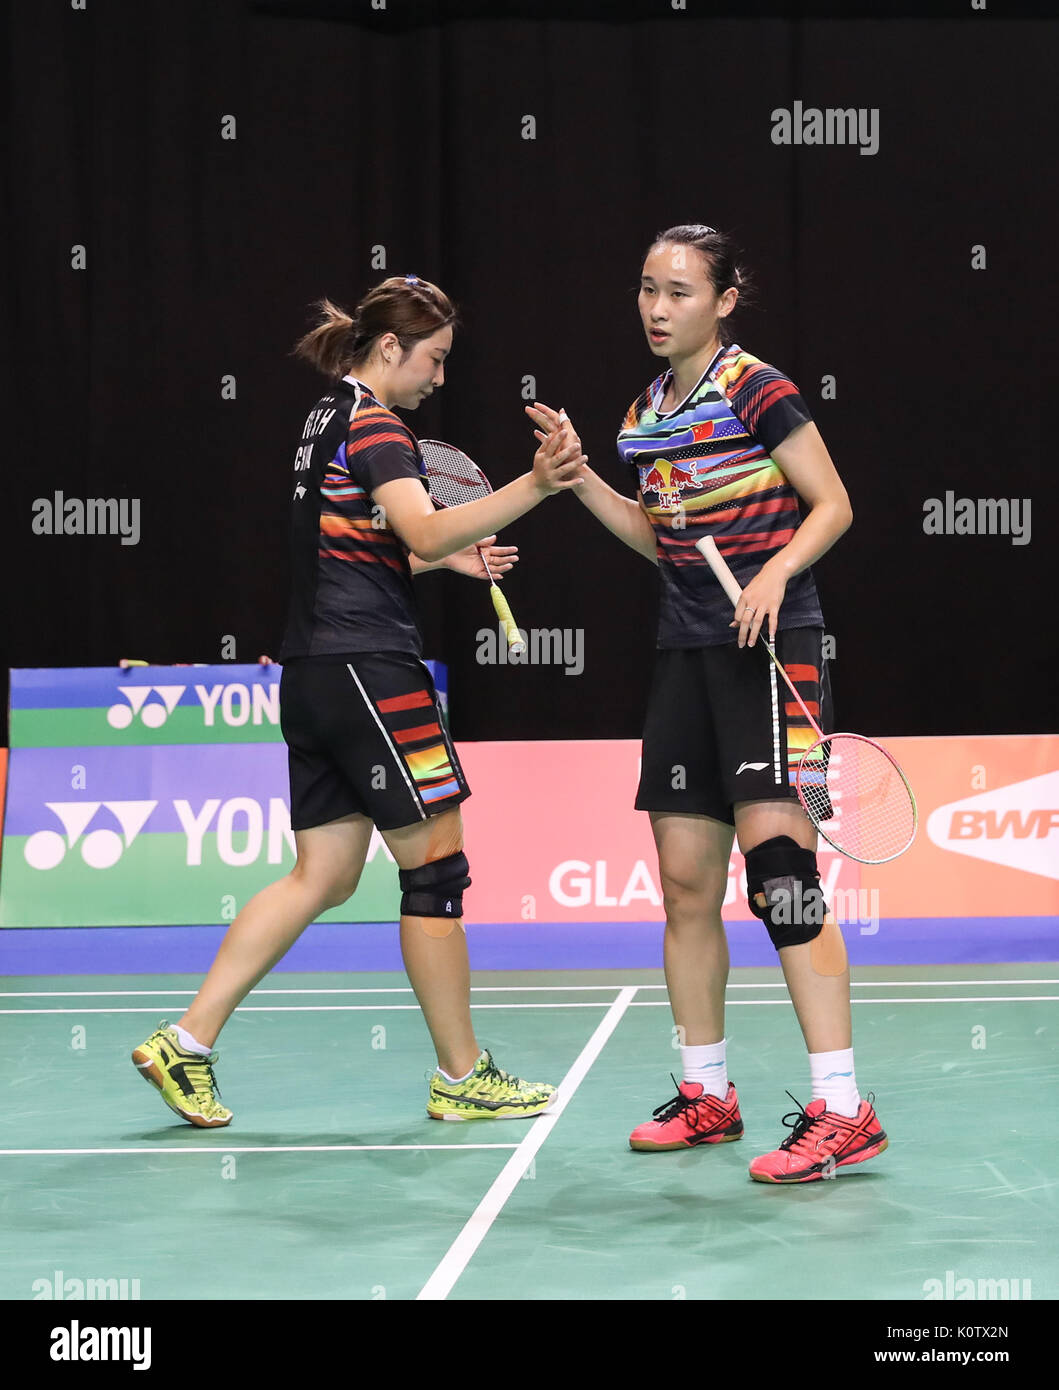 GLASGOW Aug 24 2017 Xinhua Bao Yixin R and Yu